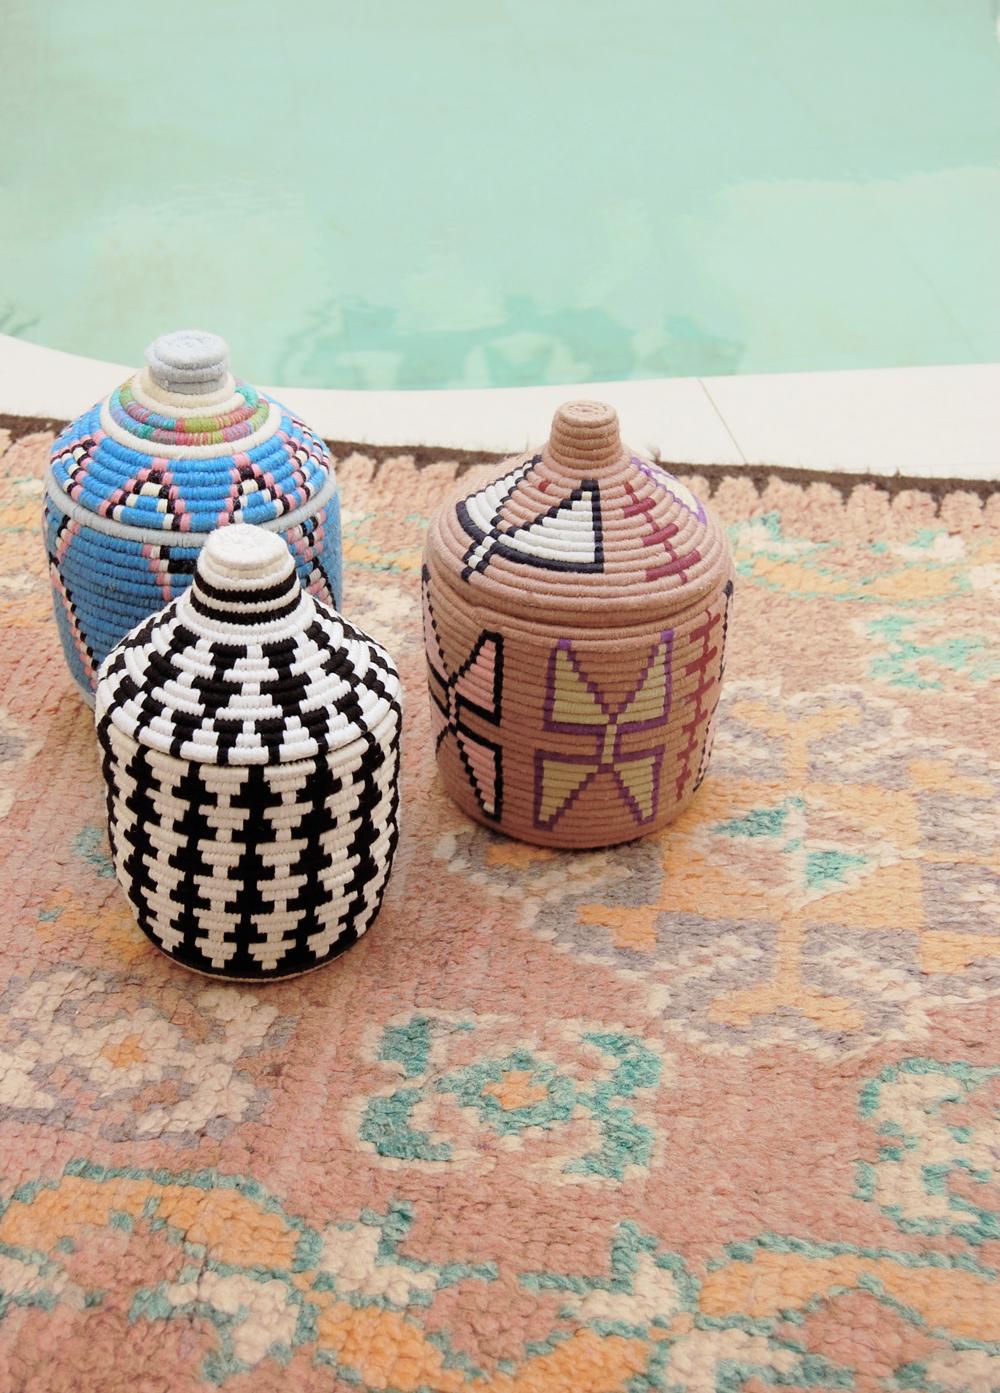 [YONDER.living] Sahara Pots lifestyle 6